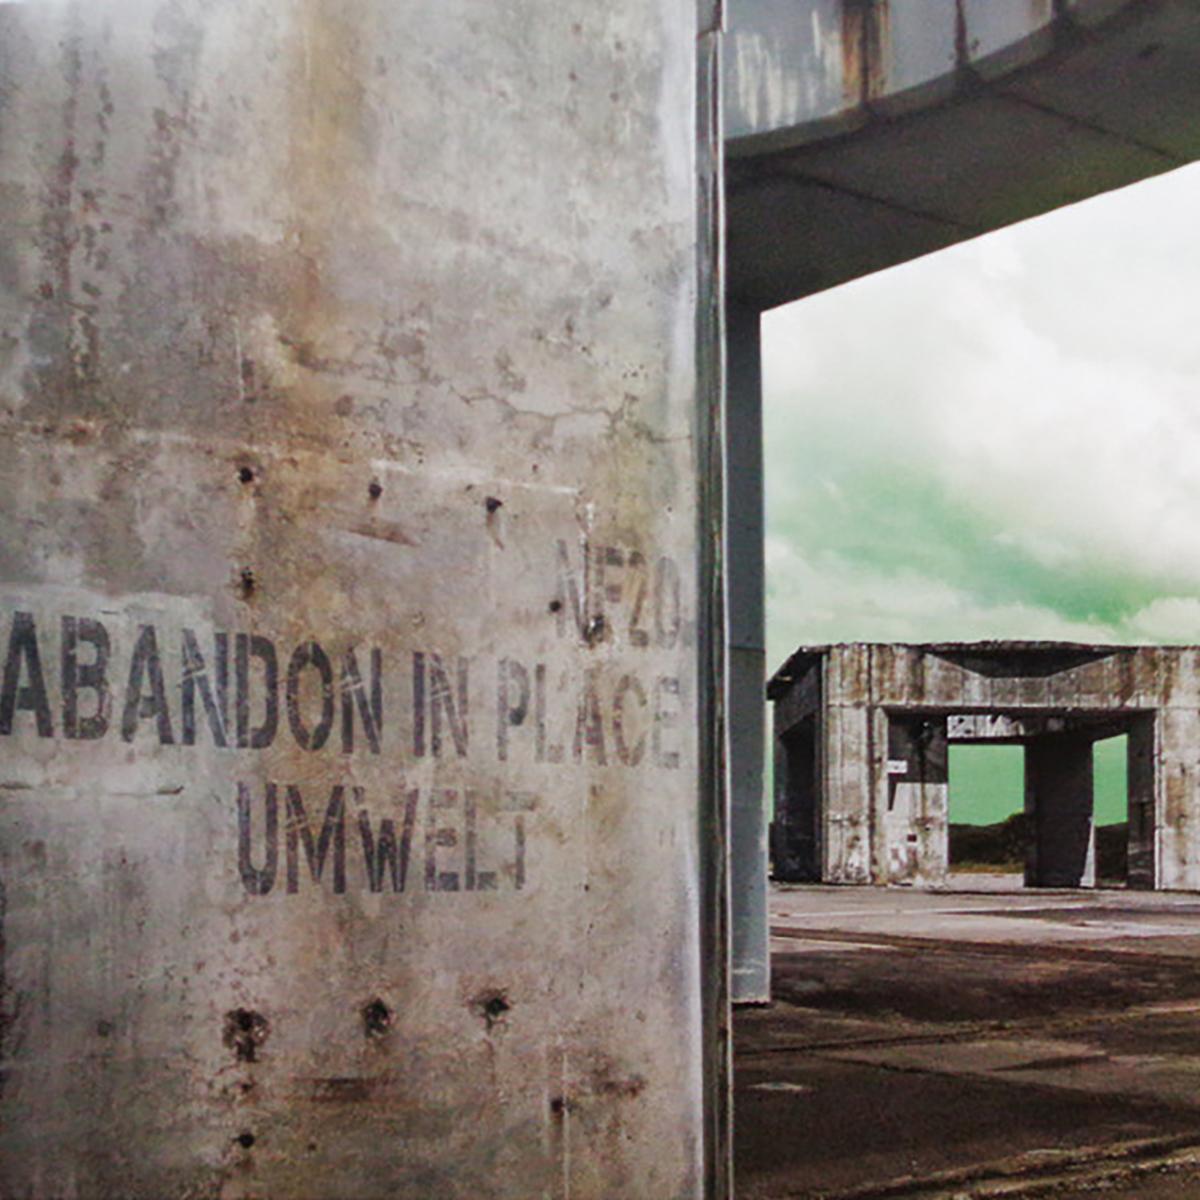 Umwelt/ABANDON IN PLACE LP